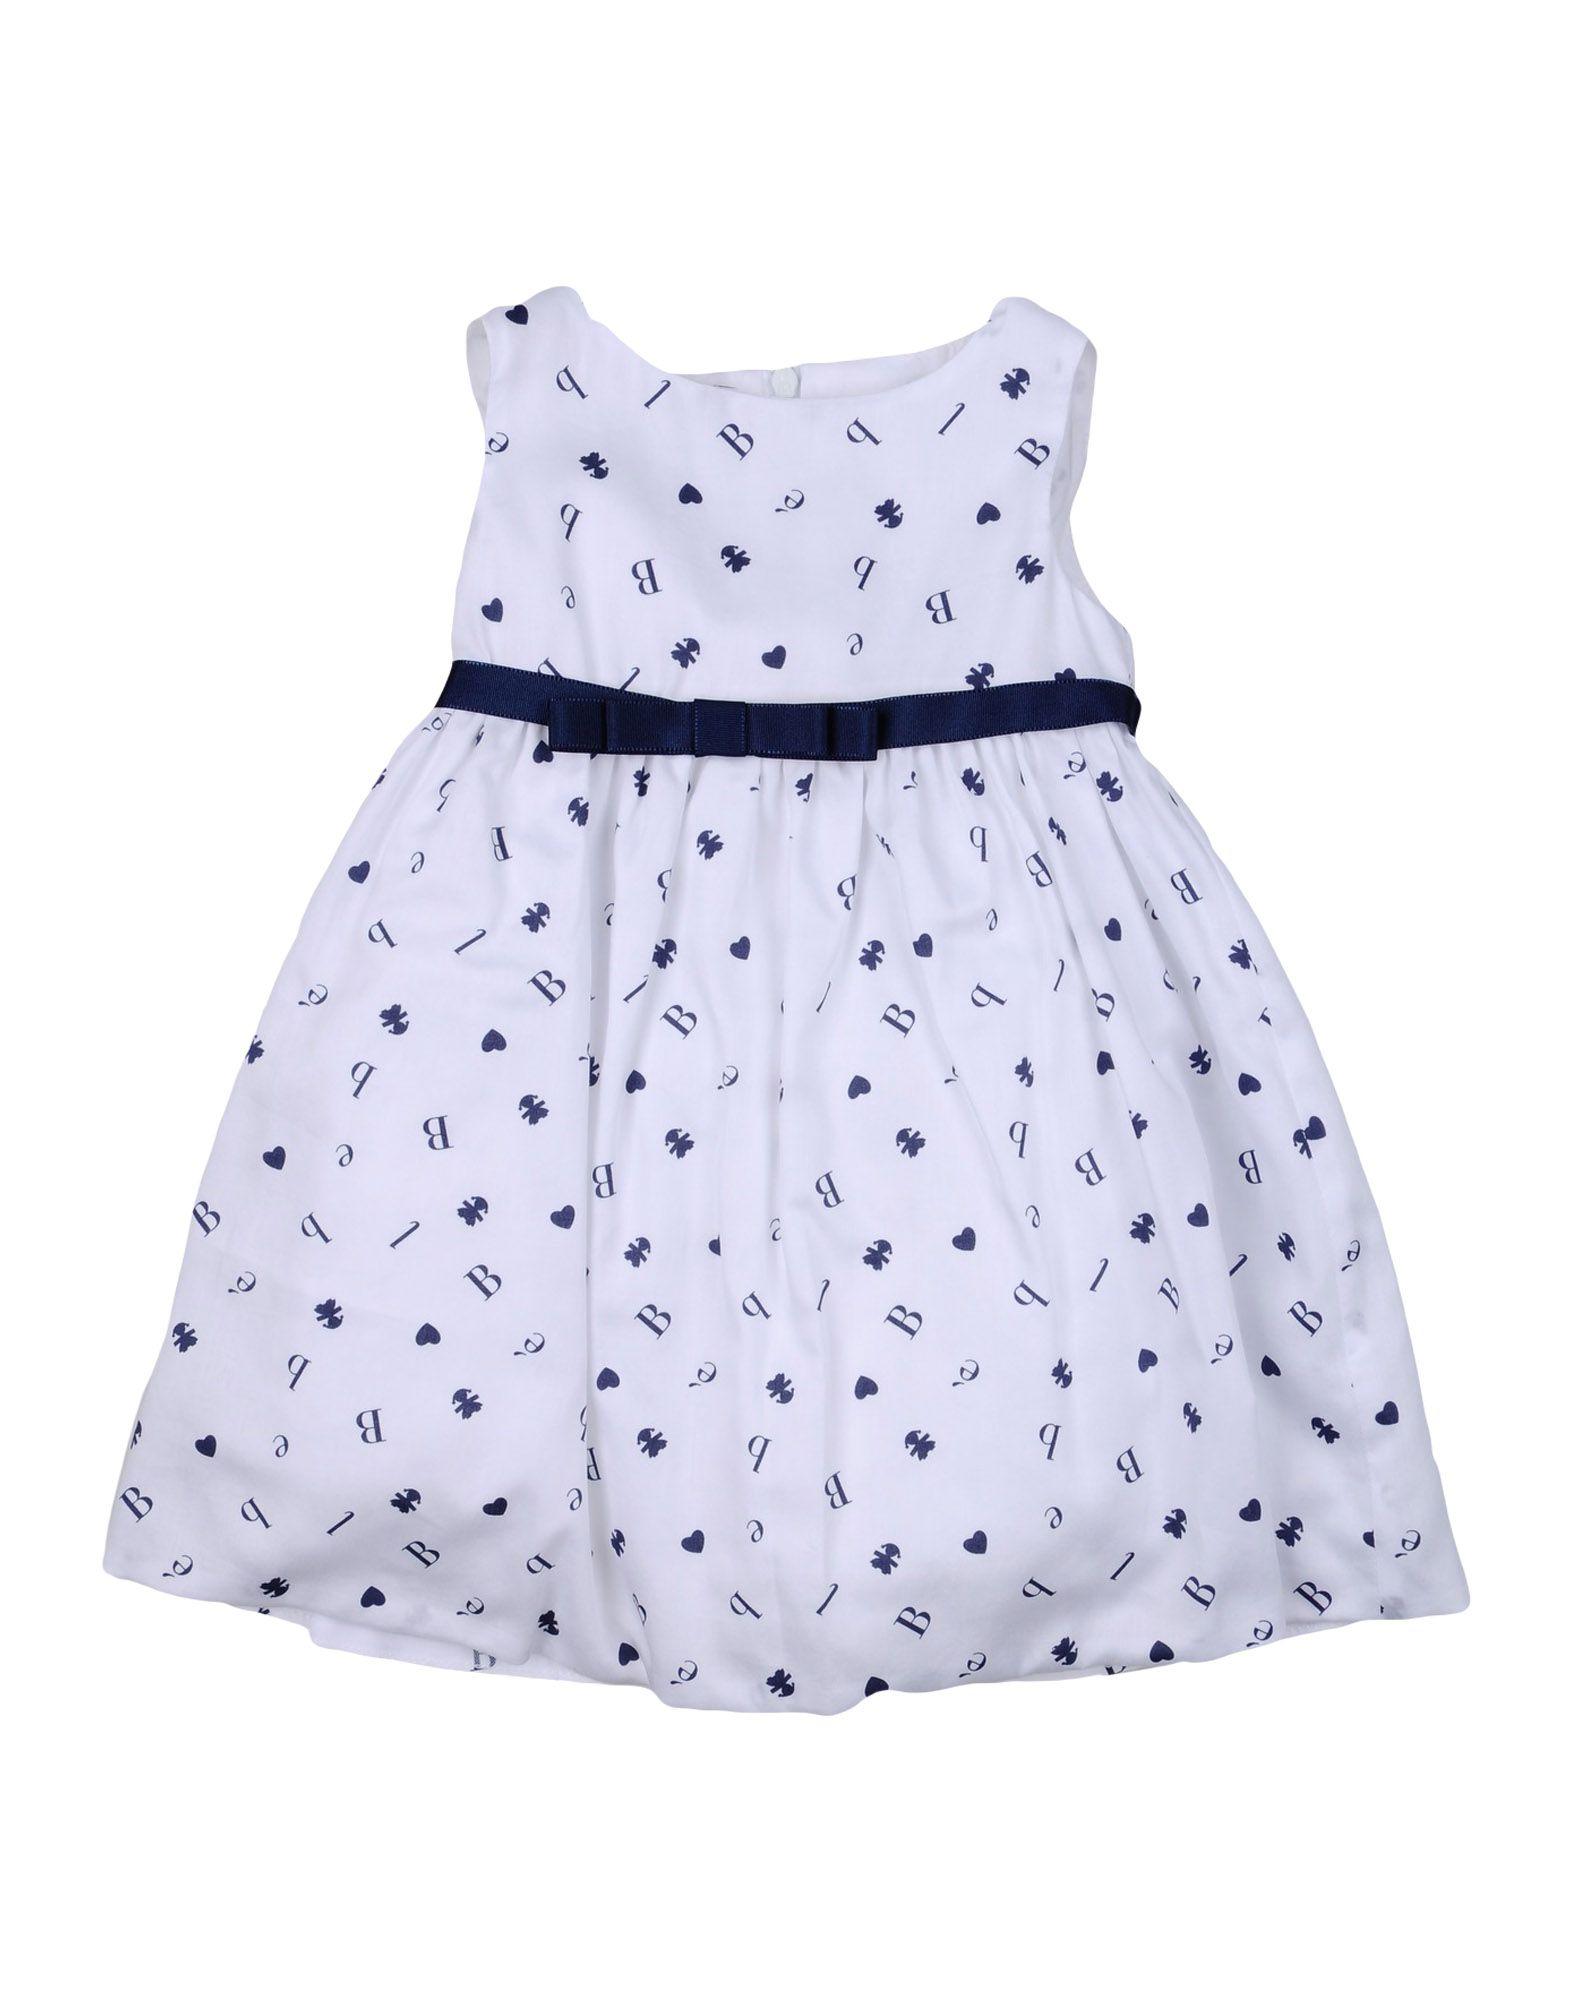 LE BEB Dresses